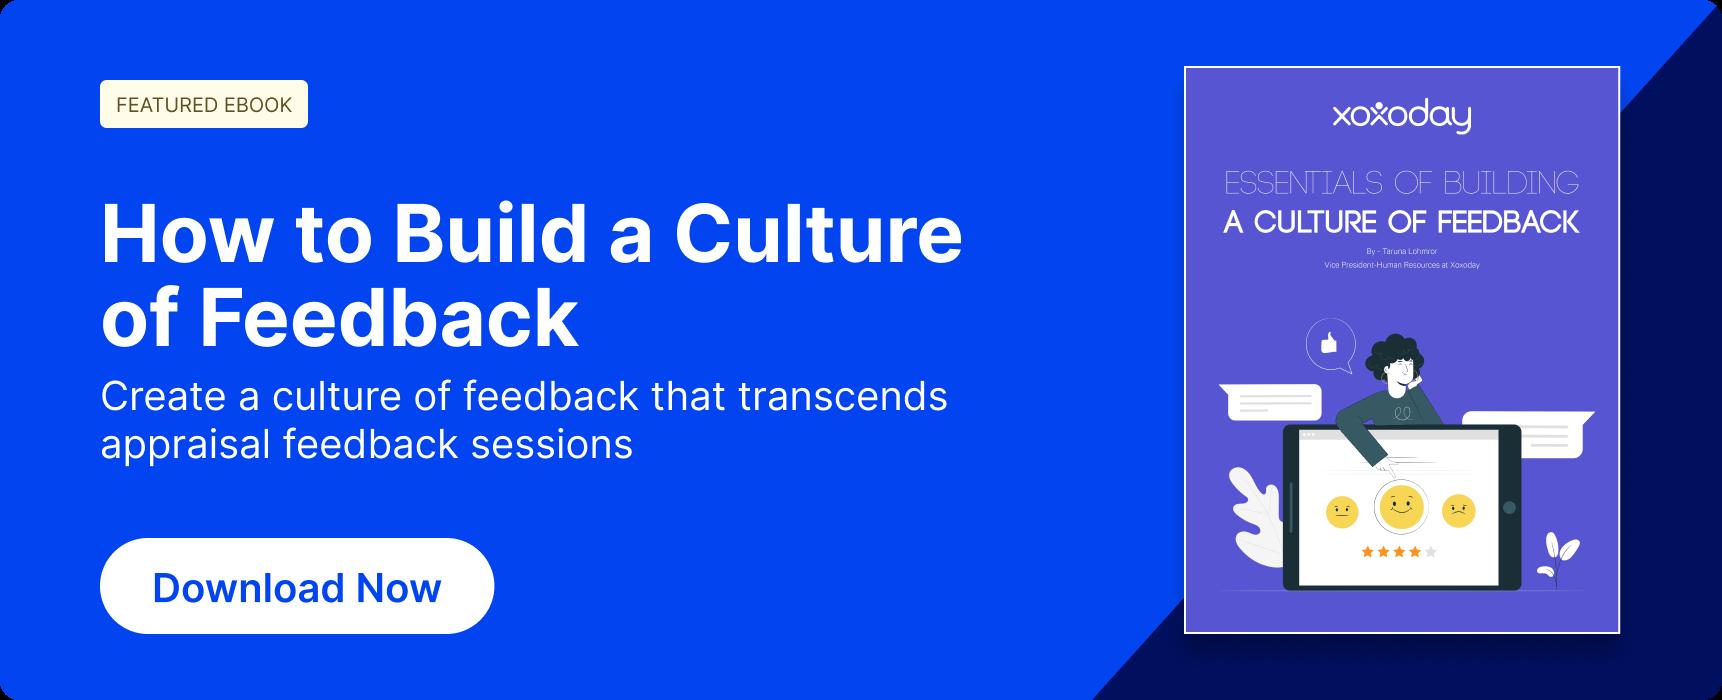 Essentials of building a culture of feedback